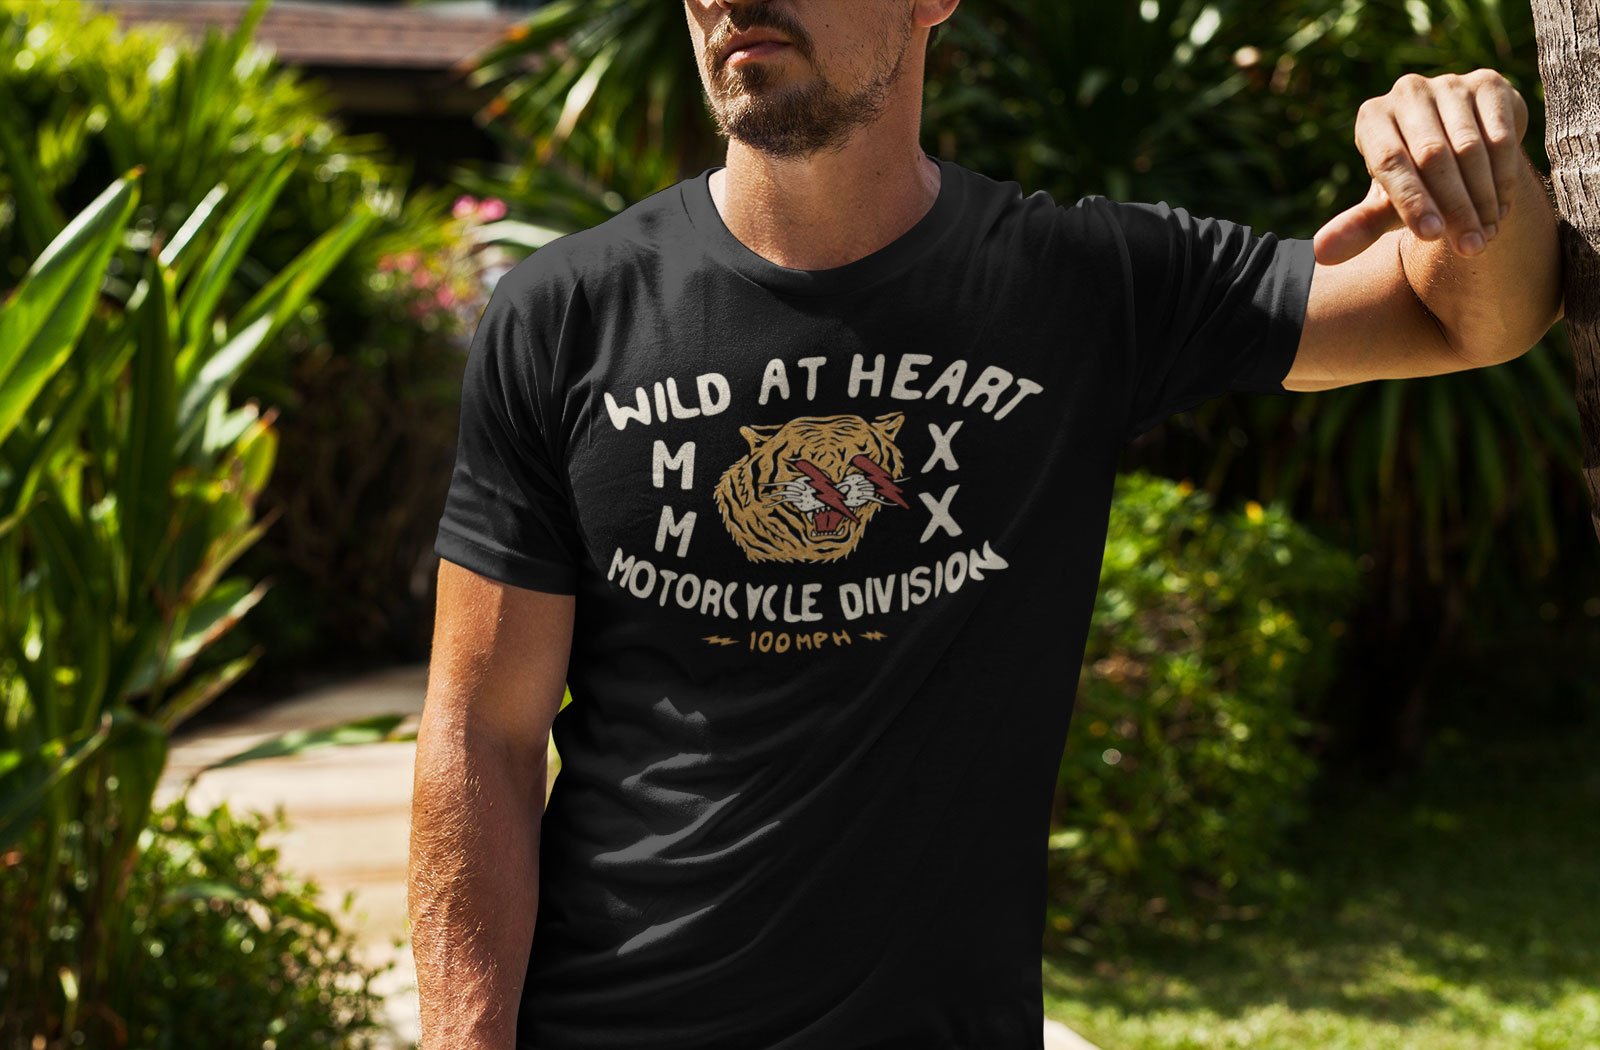 100mph Wild At Heart t-shirt